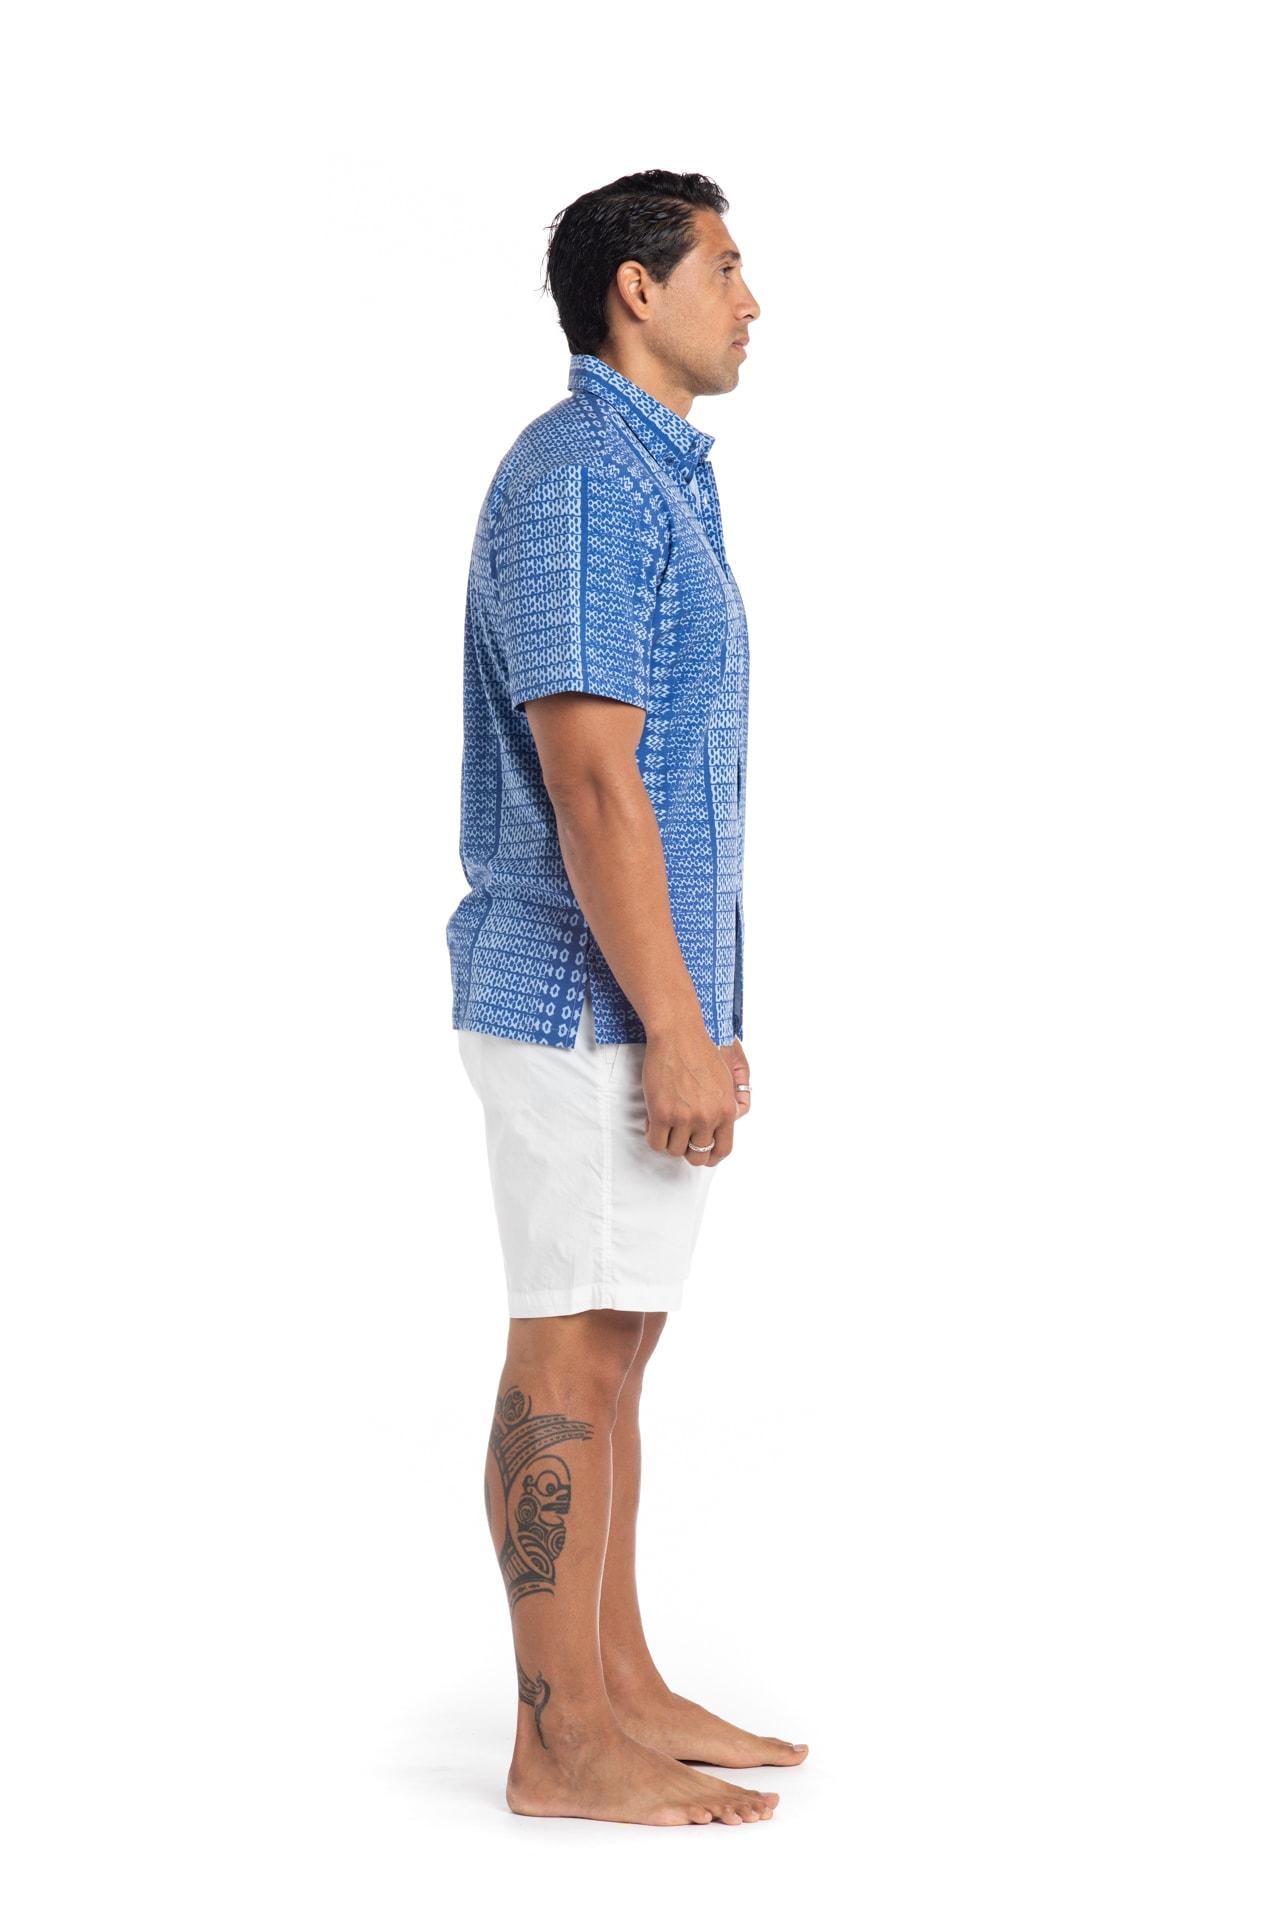 Male model wearing Mahalo Nui Shirt in Blue AkoaAkoa - Side View